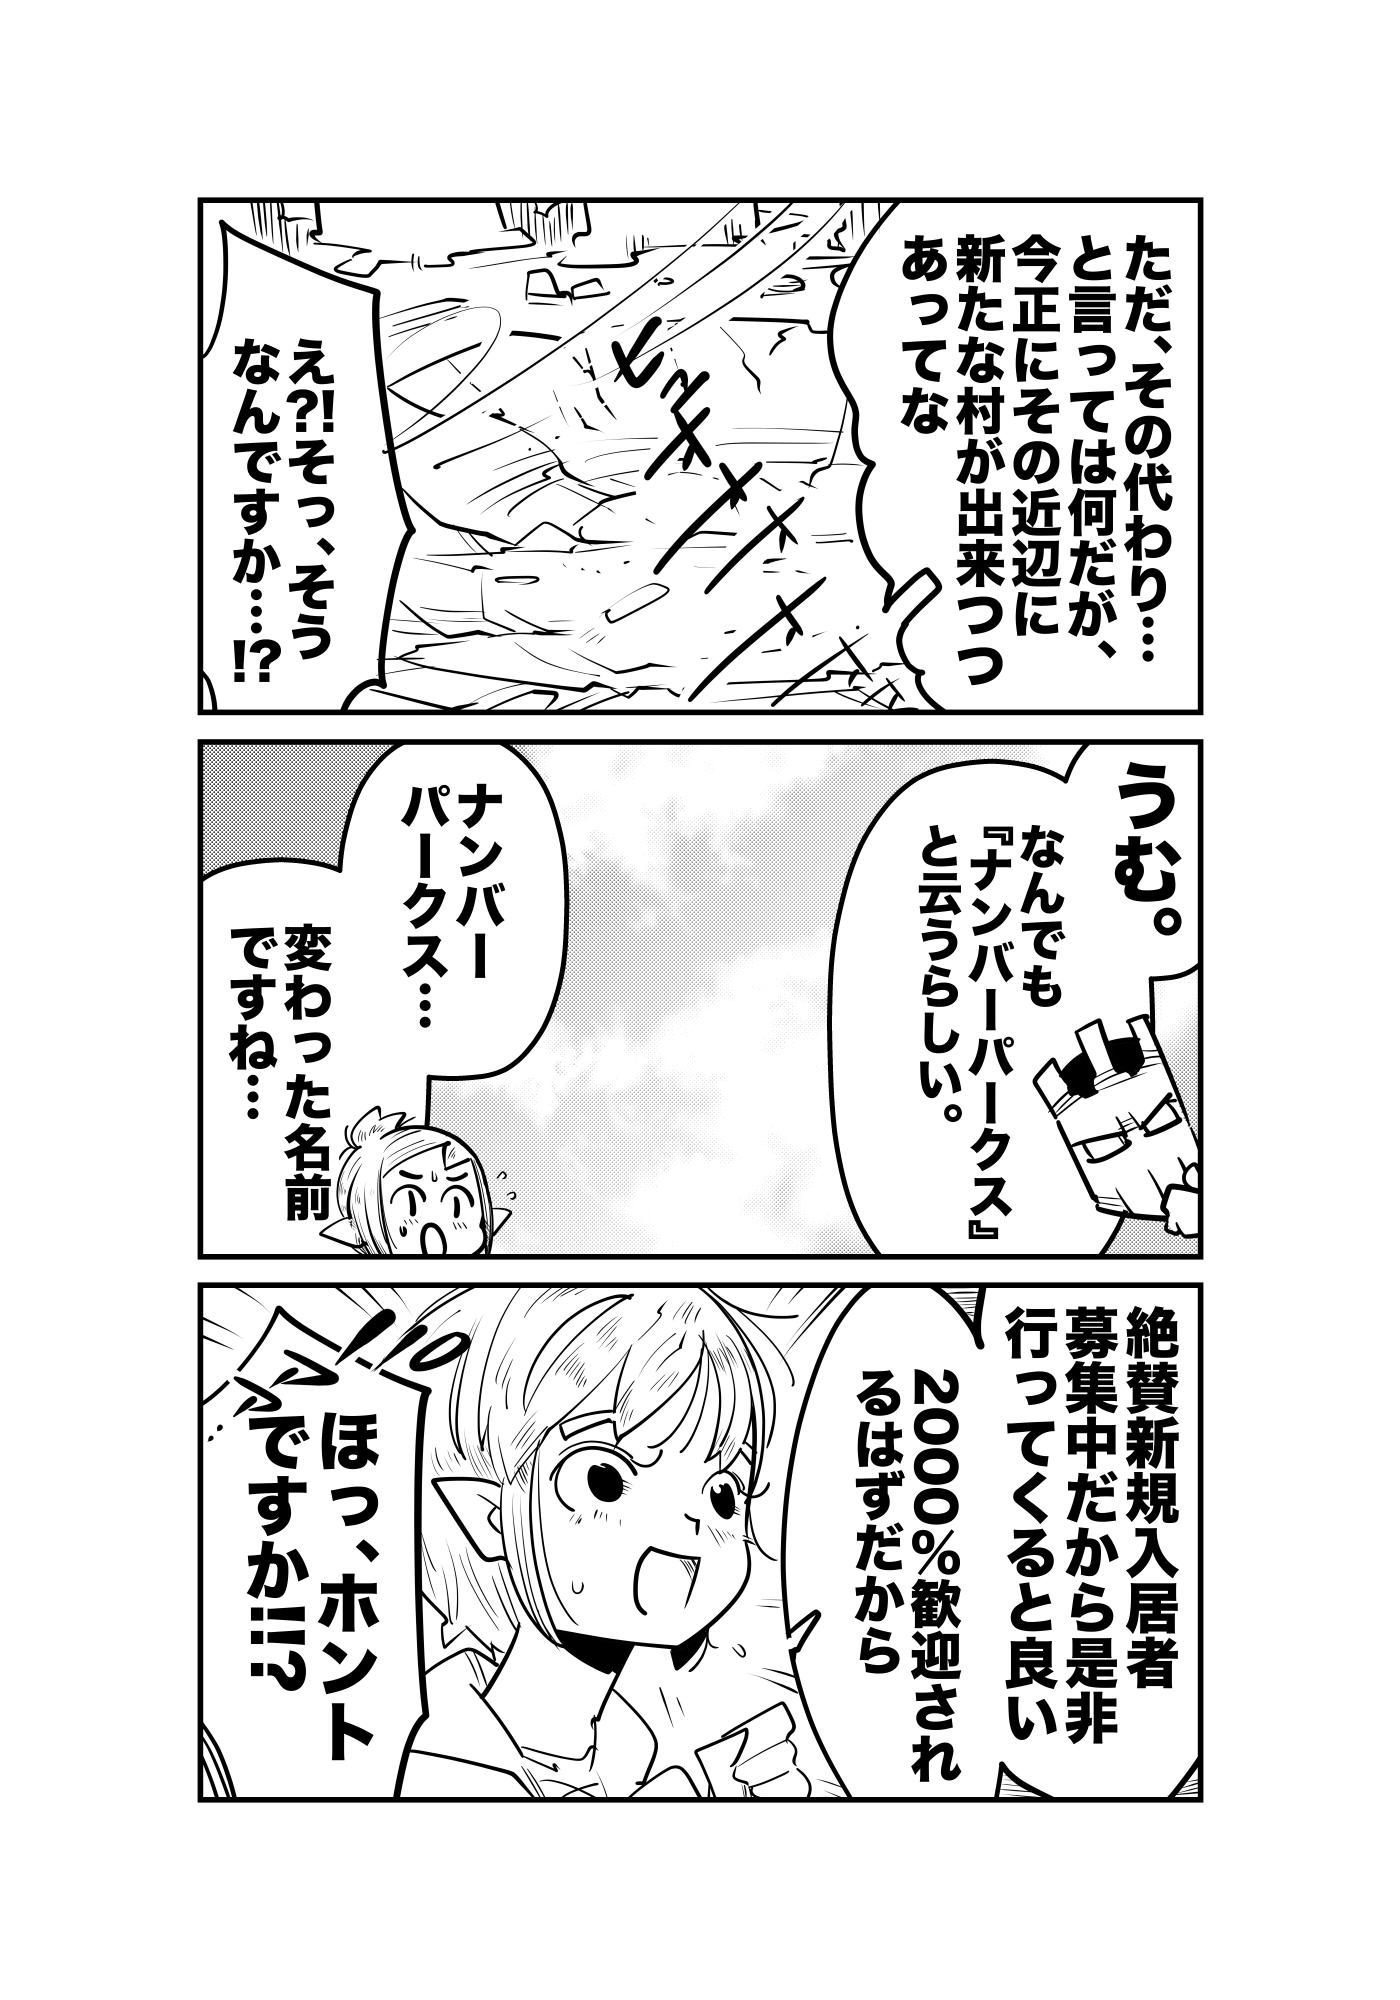 f:id:terashimaru117:20210914225832p:plain